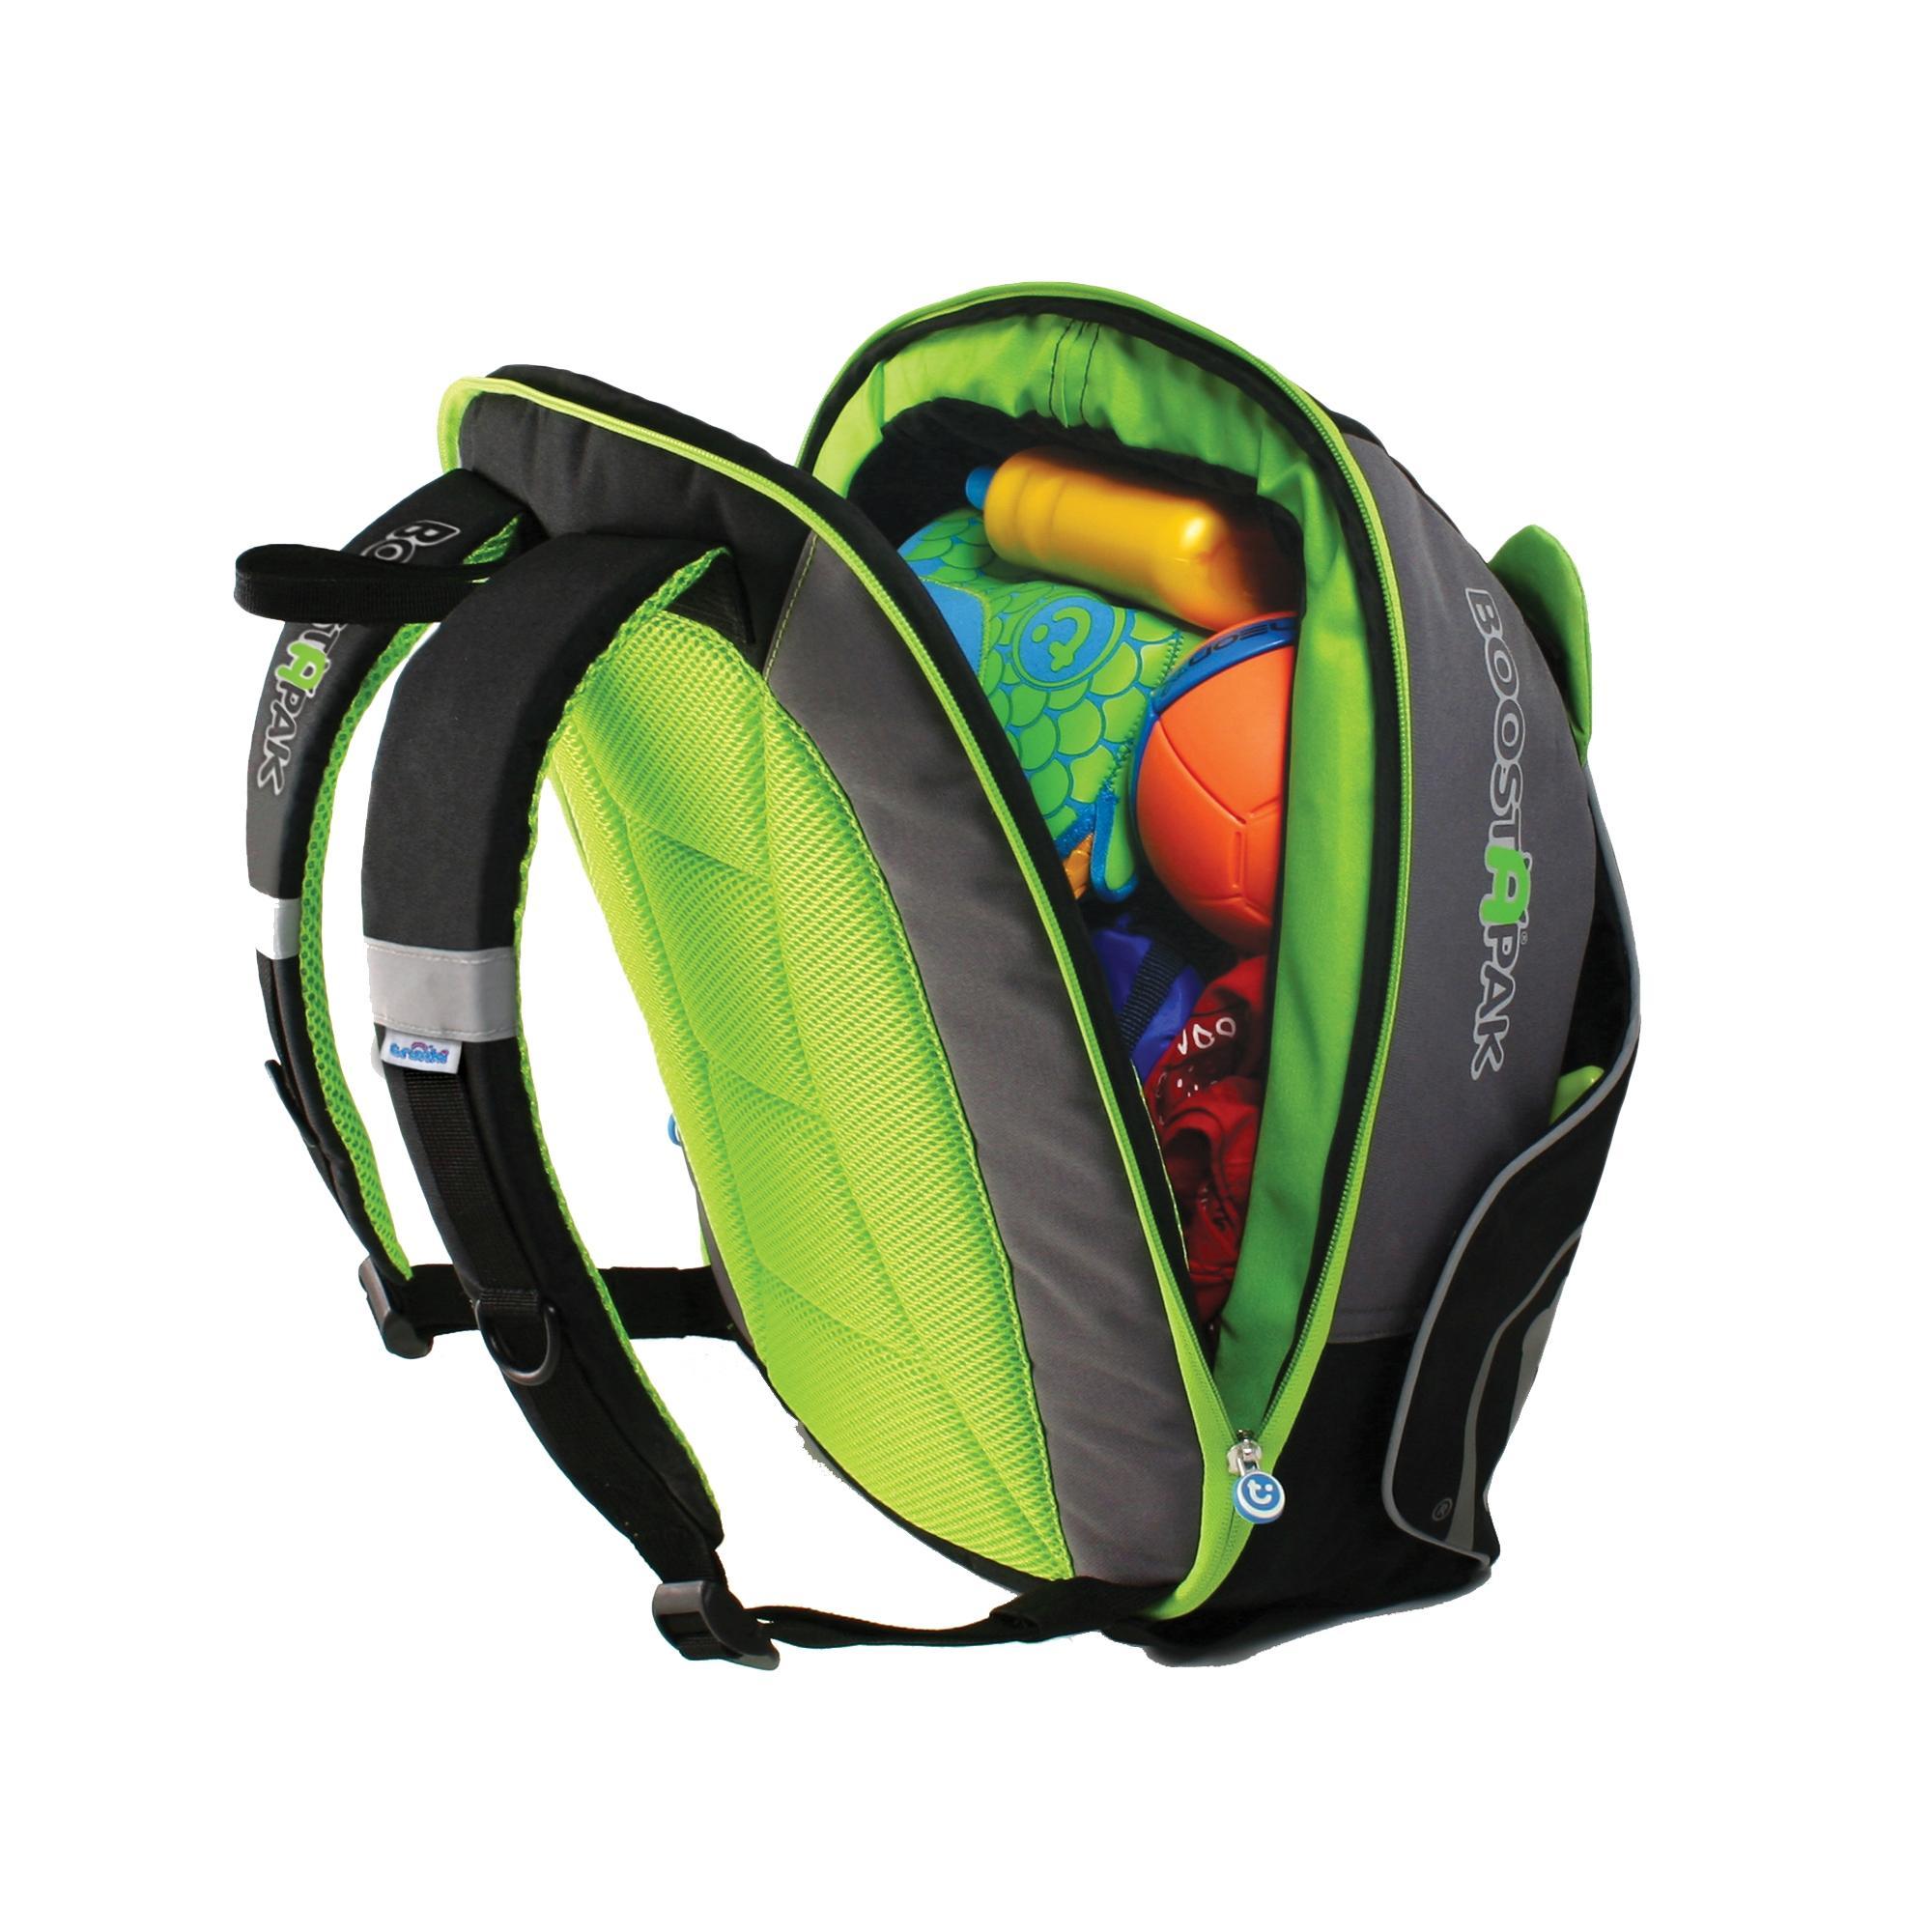 Car Seat Travel Bag Nz